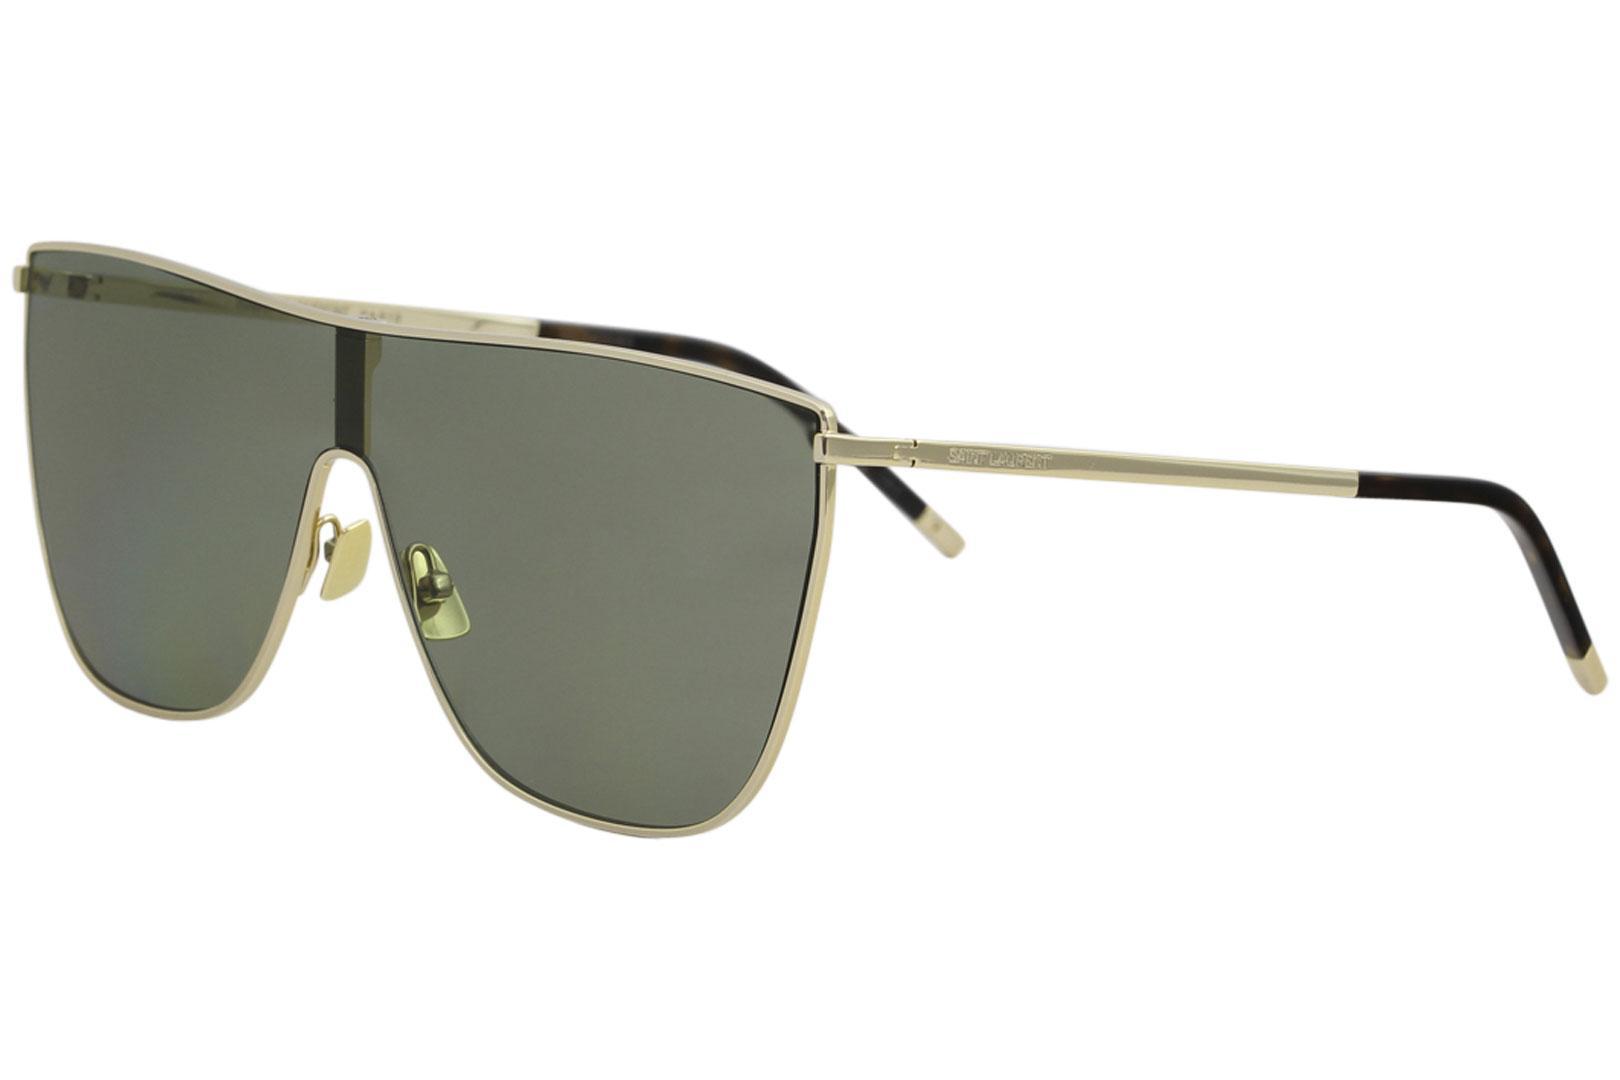 cecad3ce31b Saint Laurent Women s New Wave SL1 SL 1 Fashion Shield Sunglasses